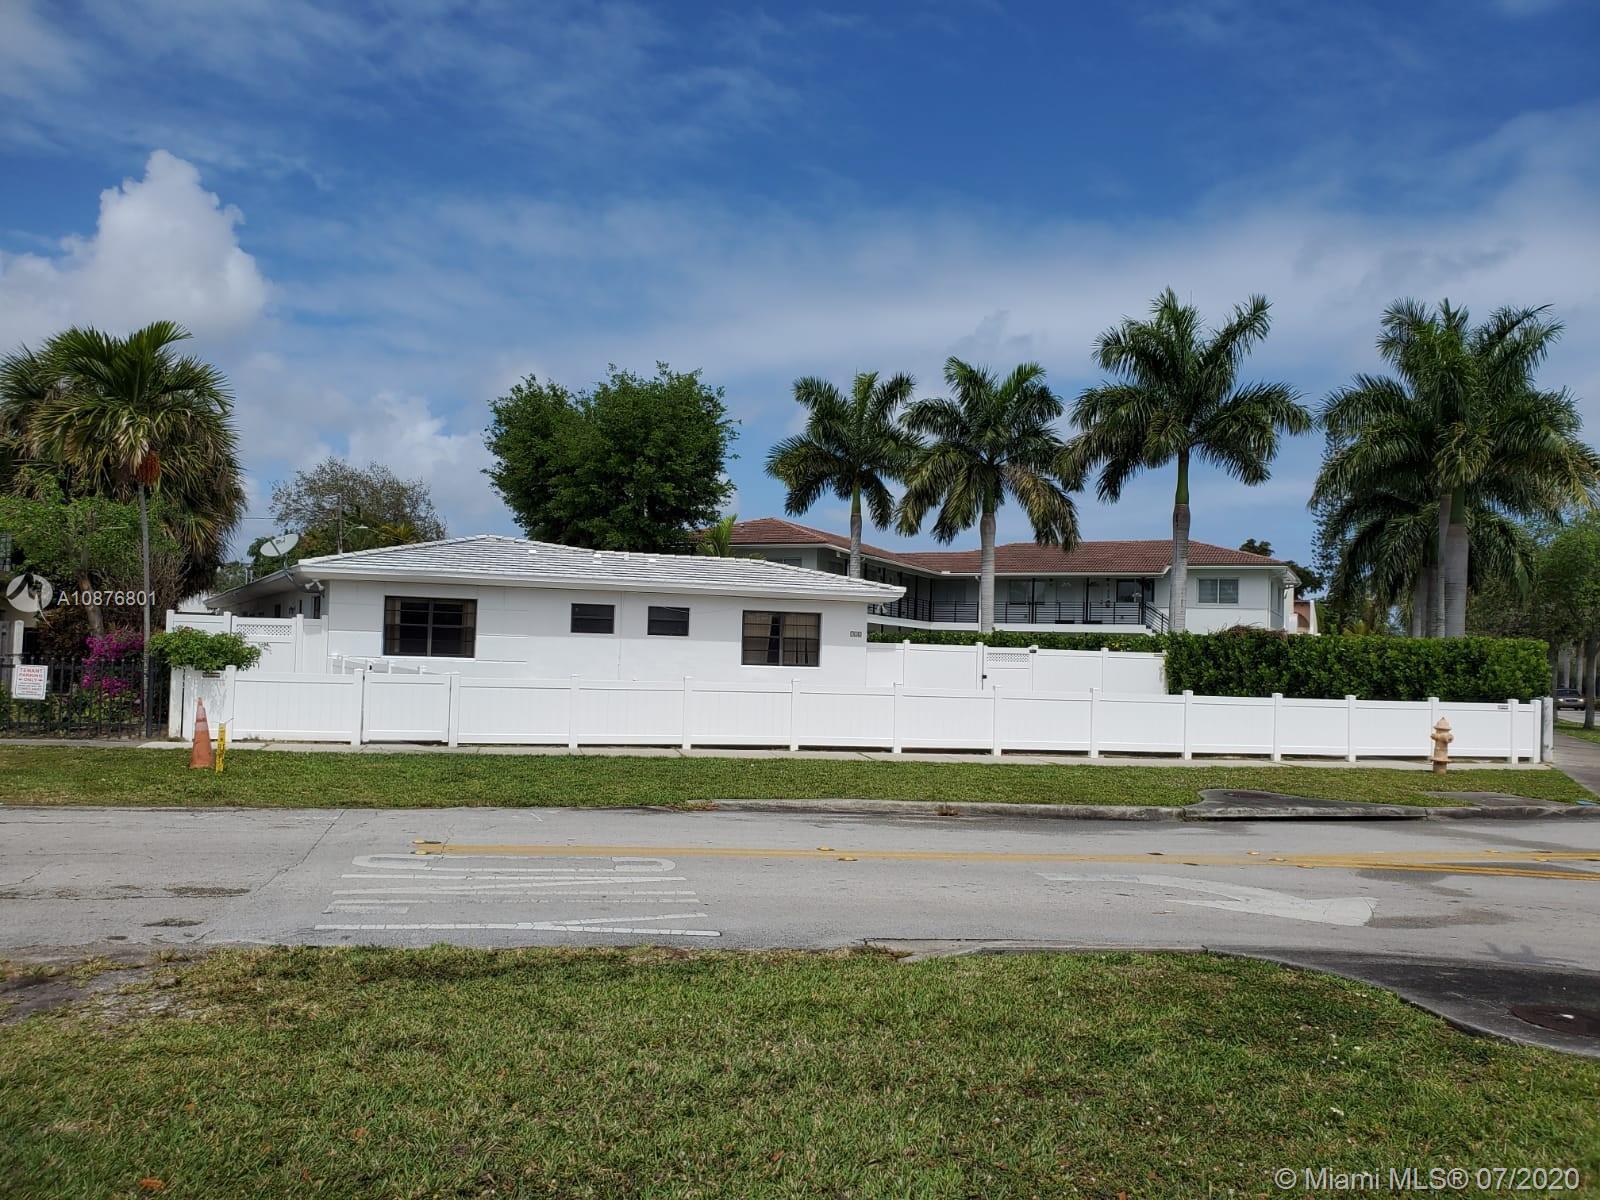 715 NE 92nd St. #4 For Sale A10876801, FL